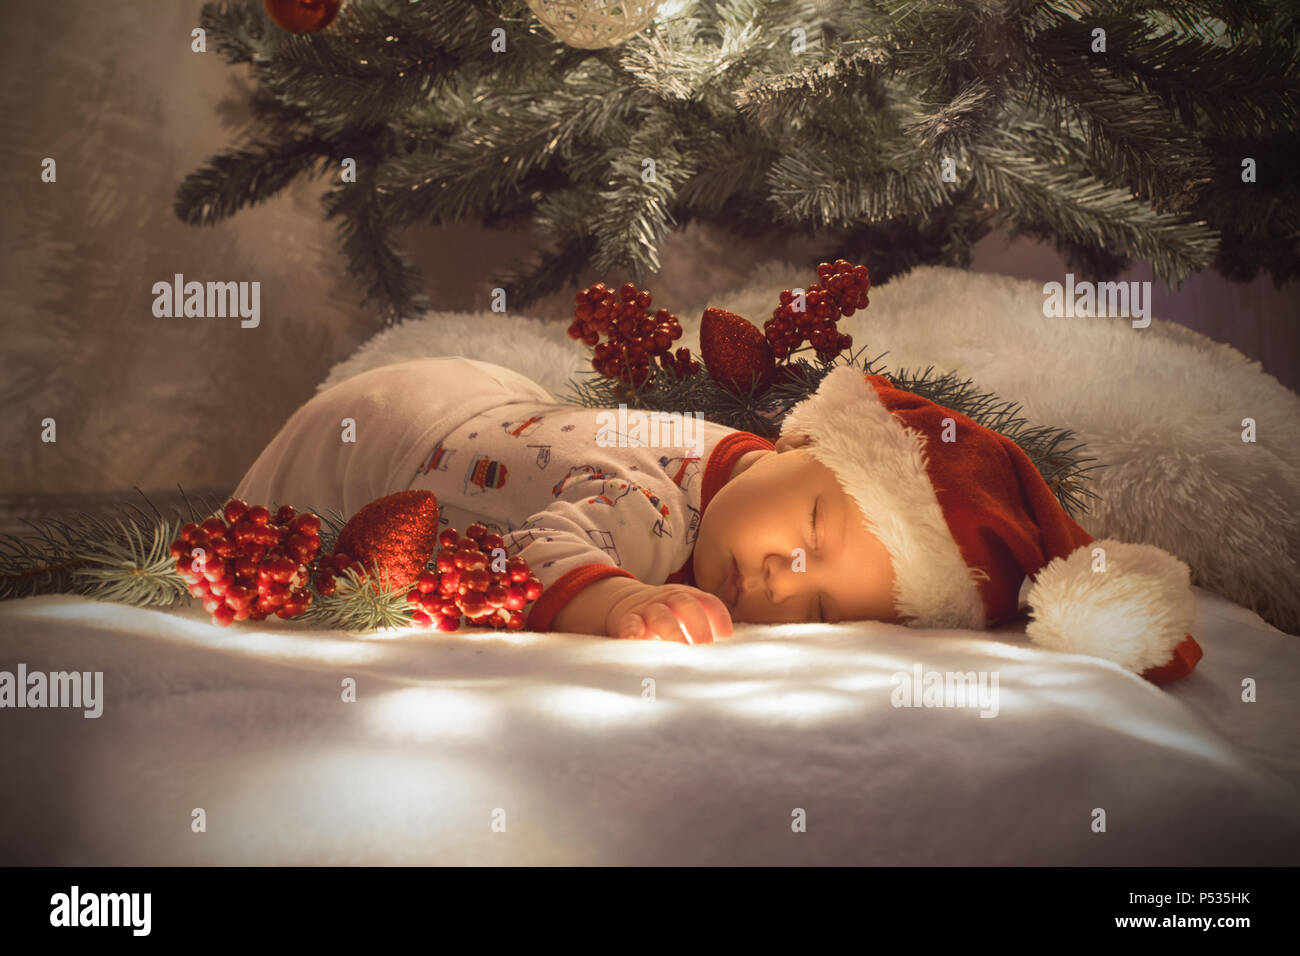 0bce8b3ad31e Newborn baby boy sleeping under Christmas tree near lot of decorations. Wearing  Santa´s